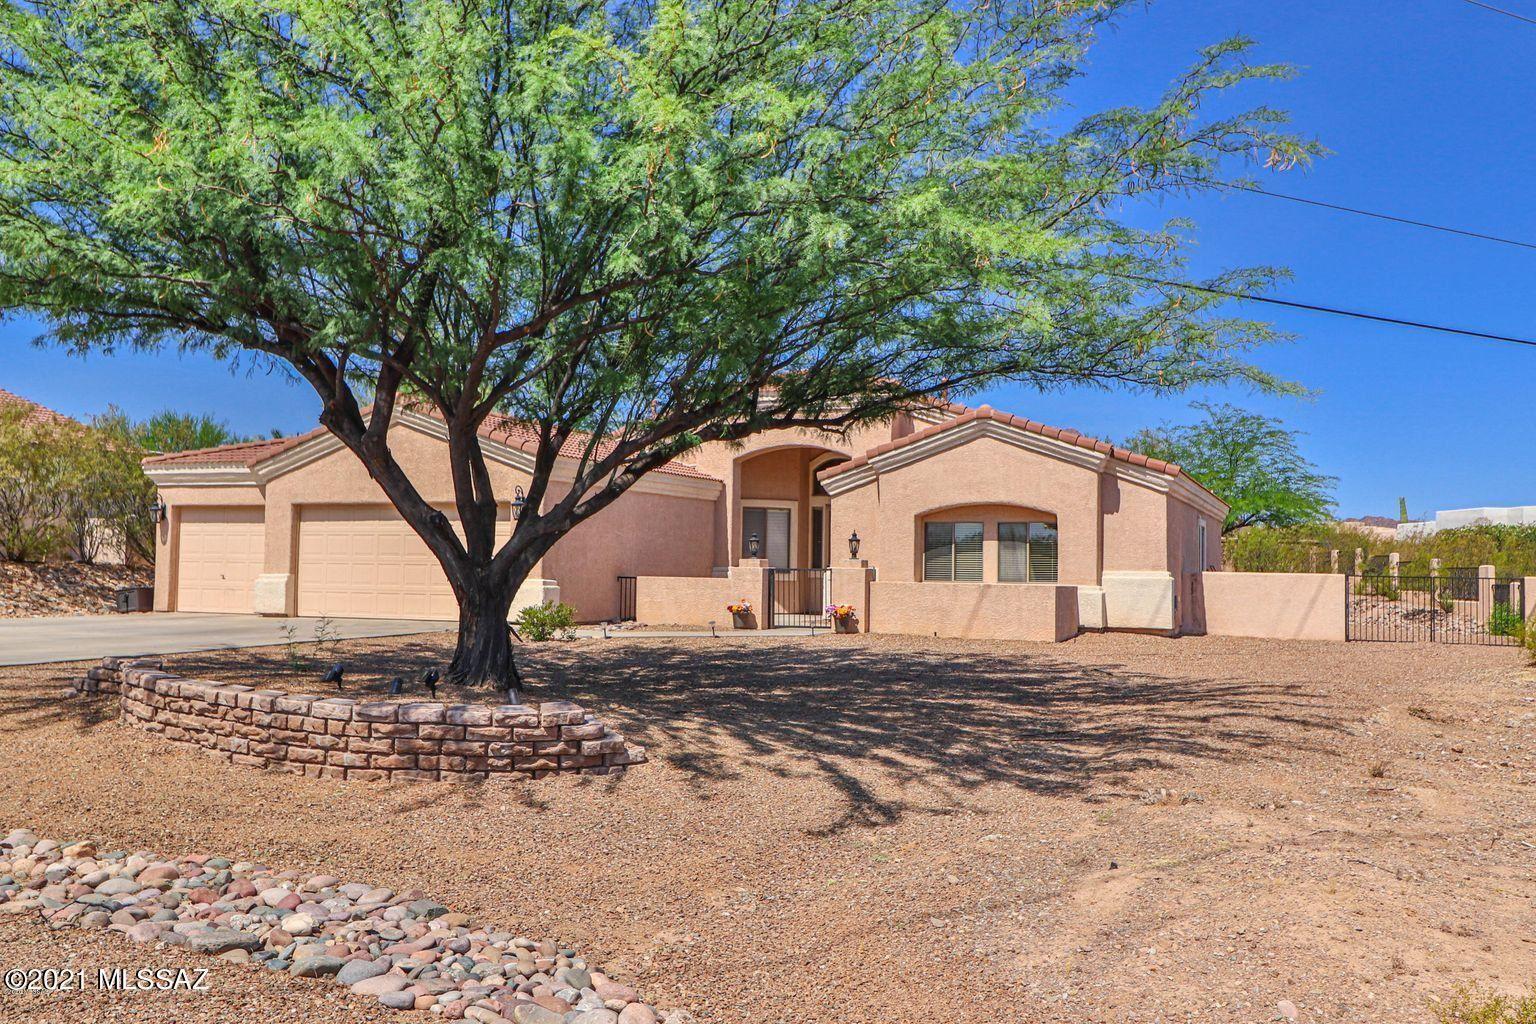 7993 N Via Laguna Niguel, Tucson, AZ 85743 - #: 22103064